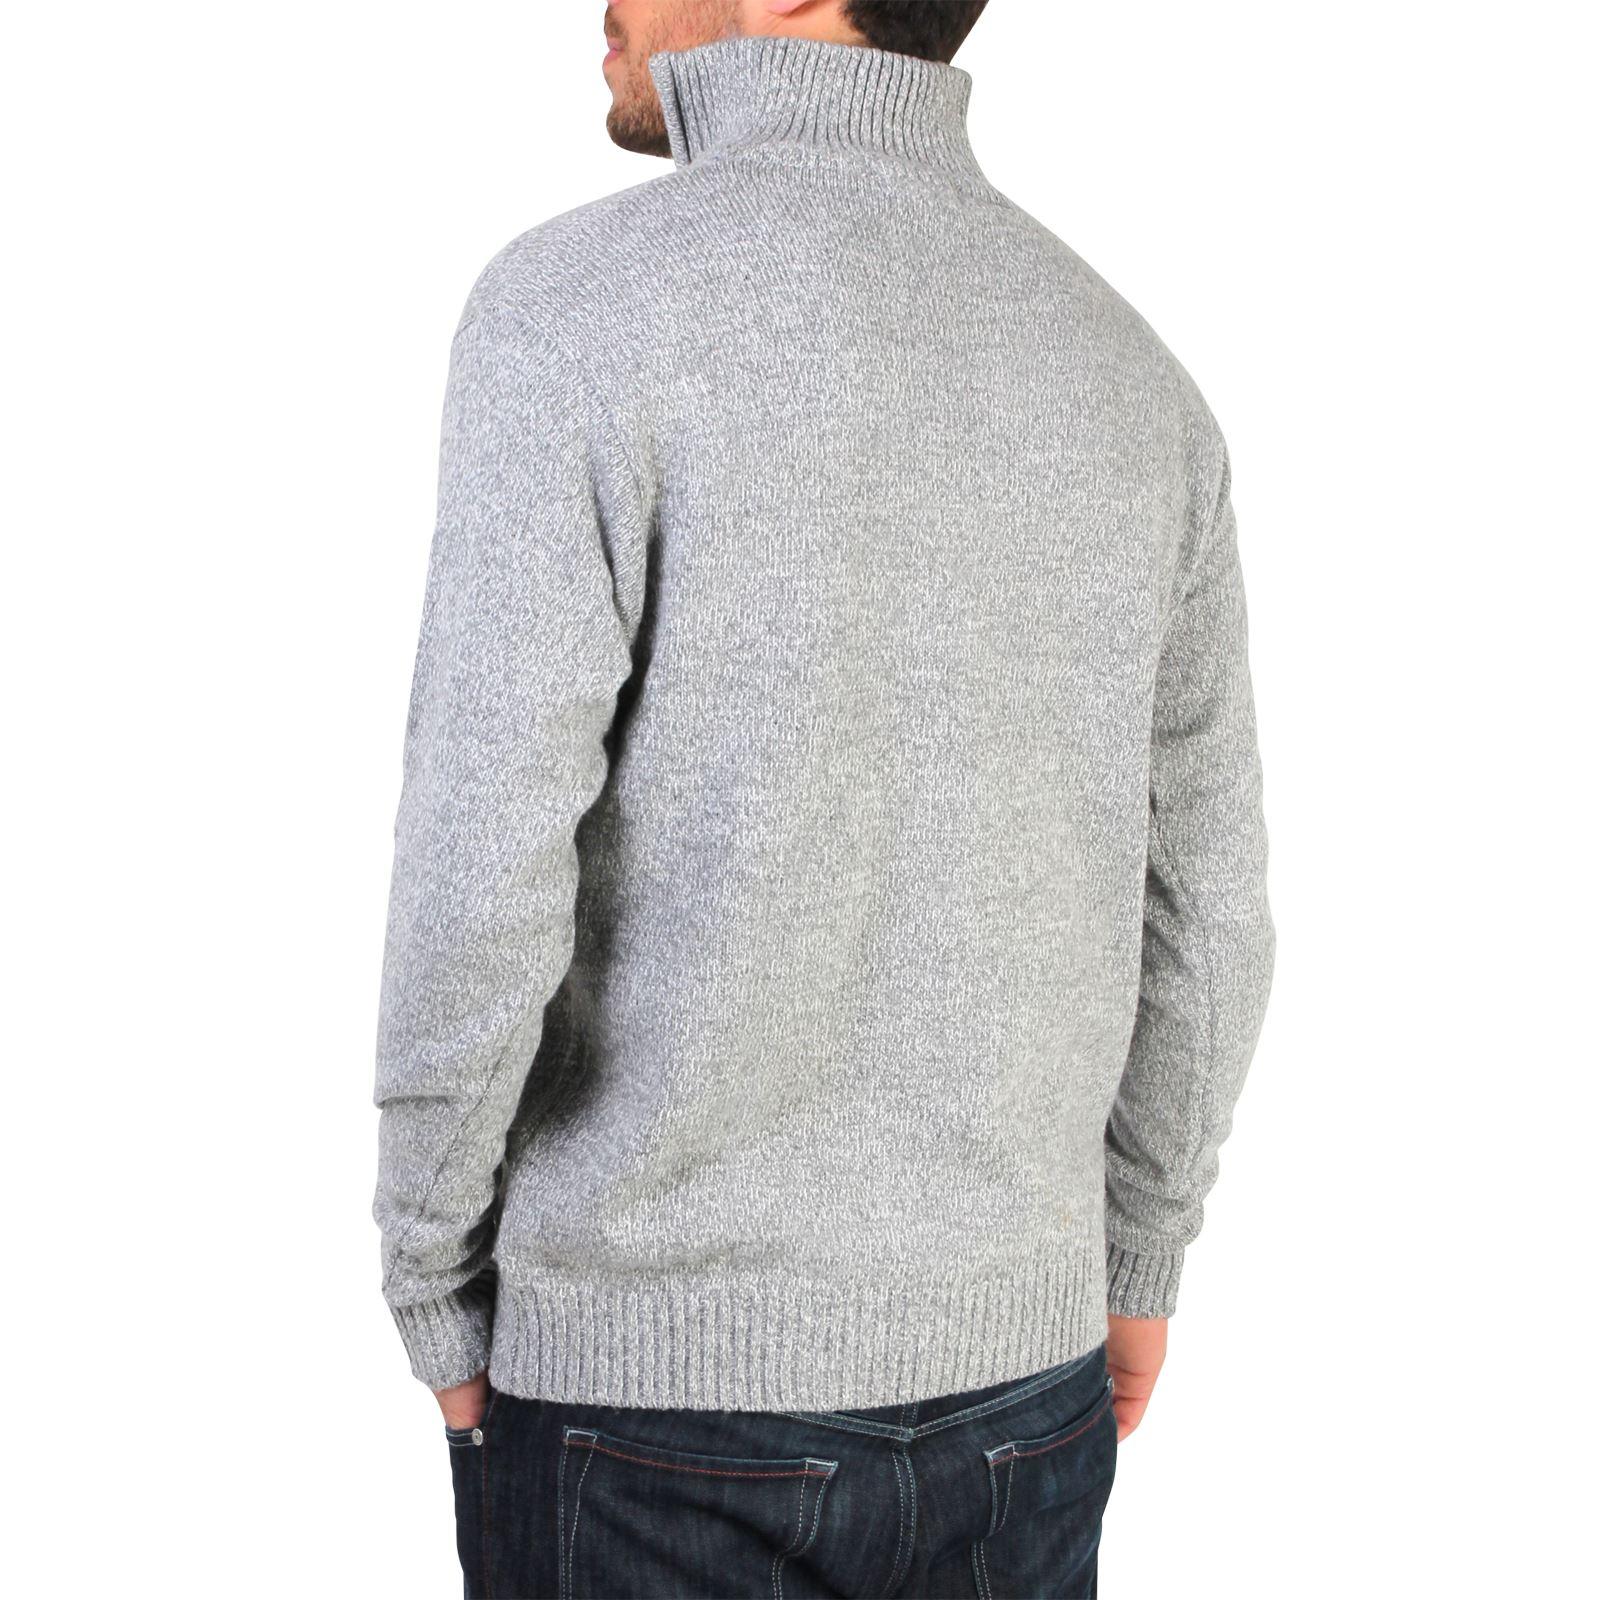 Mens-Soft-Wool-Knit-Half-Zip-Funnel-Neck-Jumper-Sweater-Top-Grandad-Pullover-Top thumbnail 7